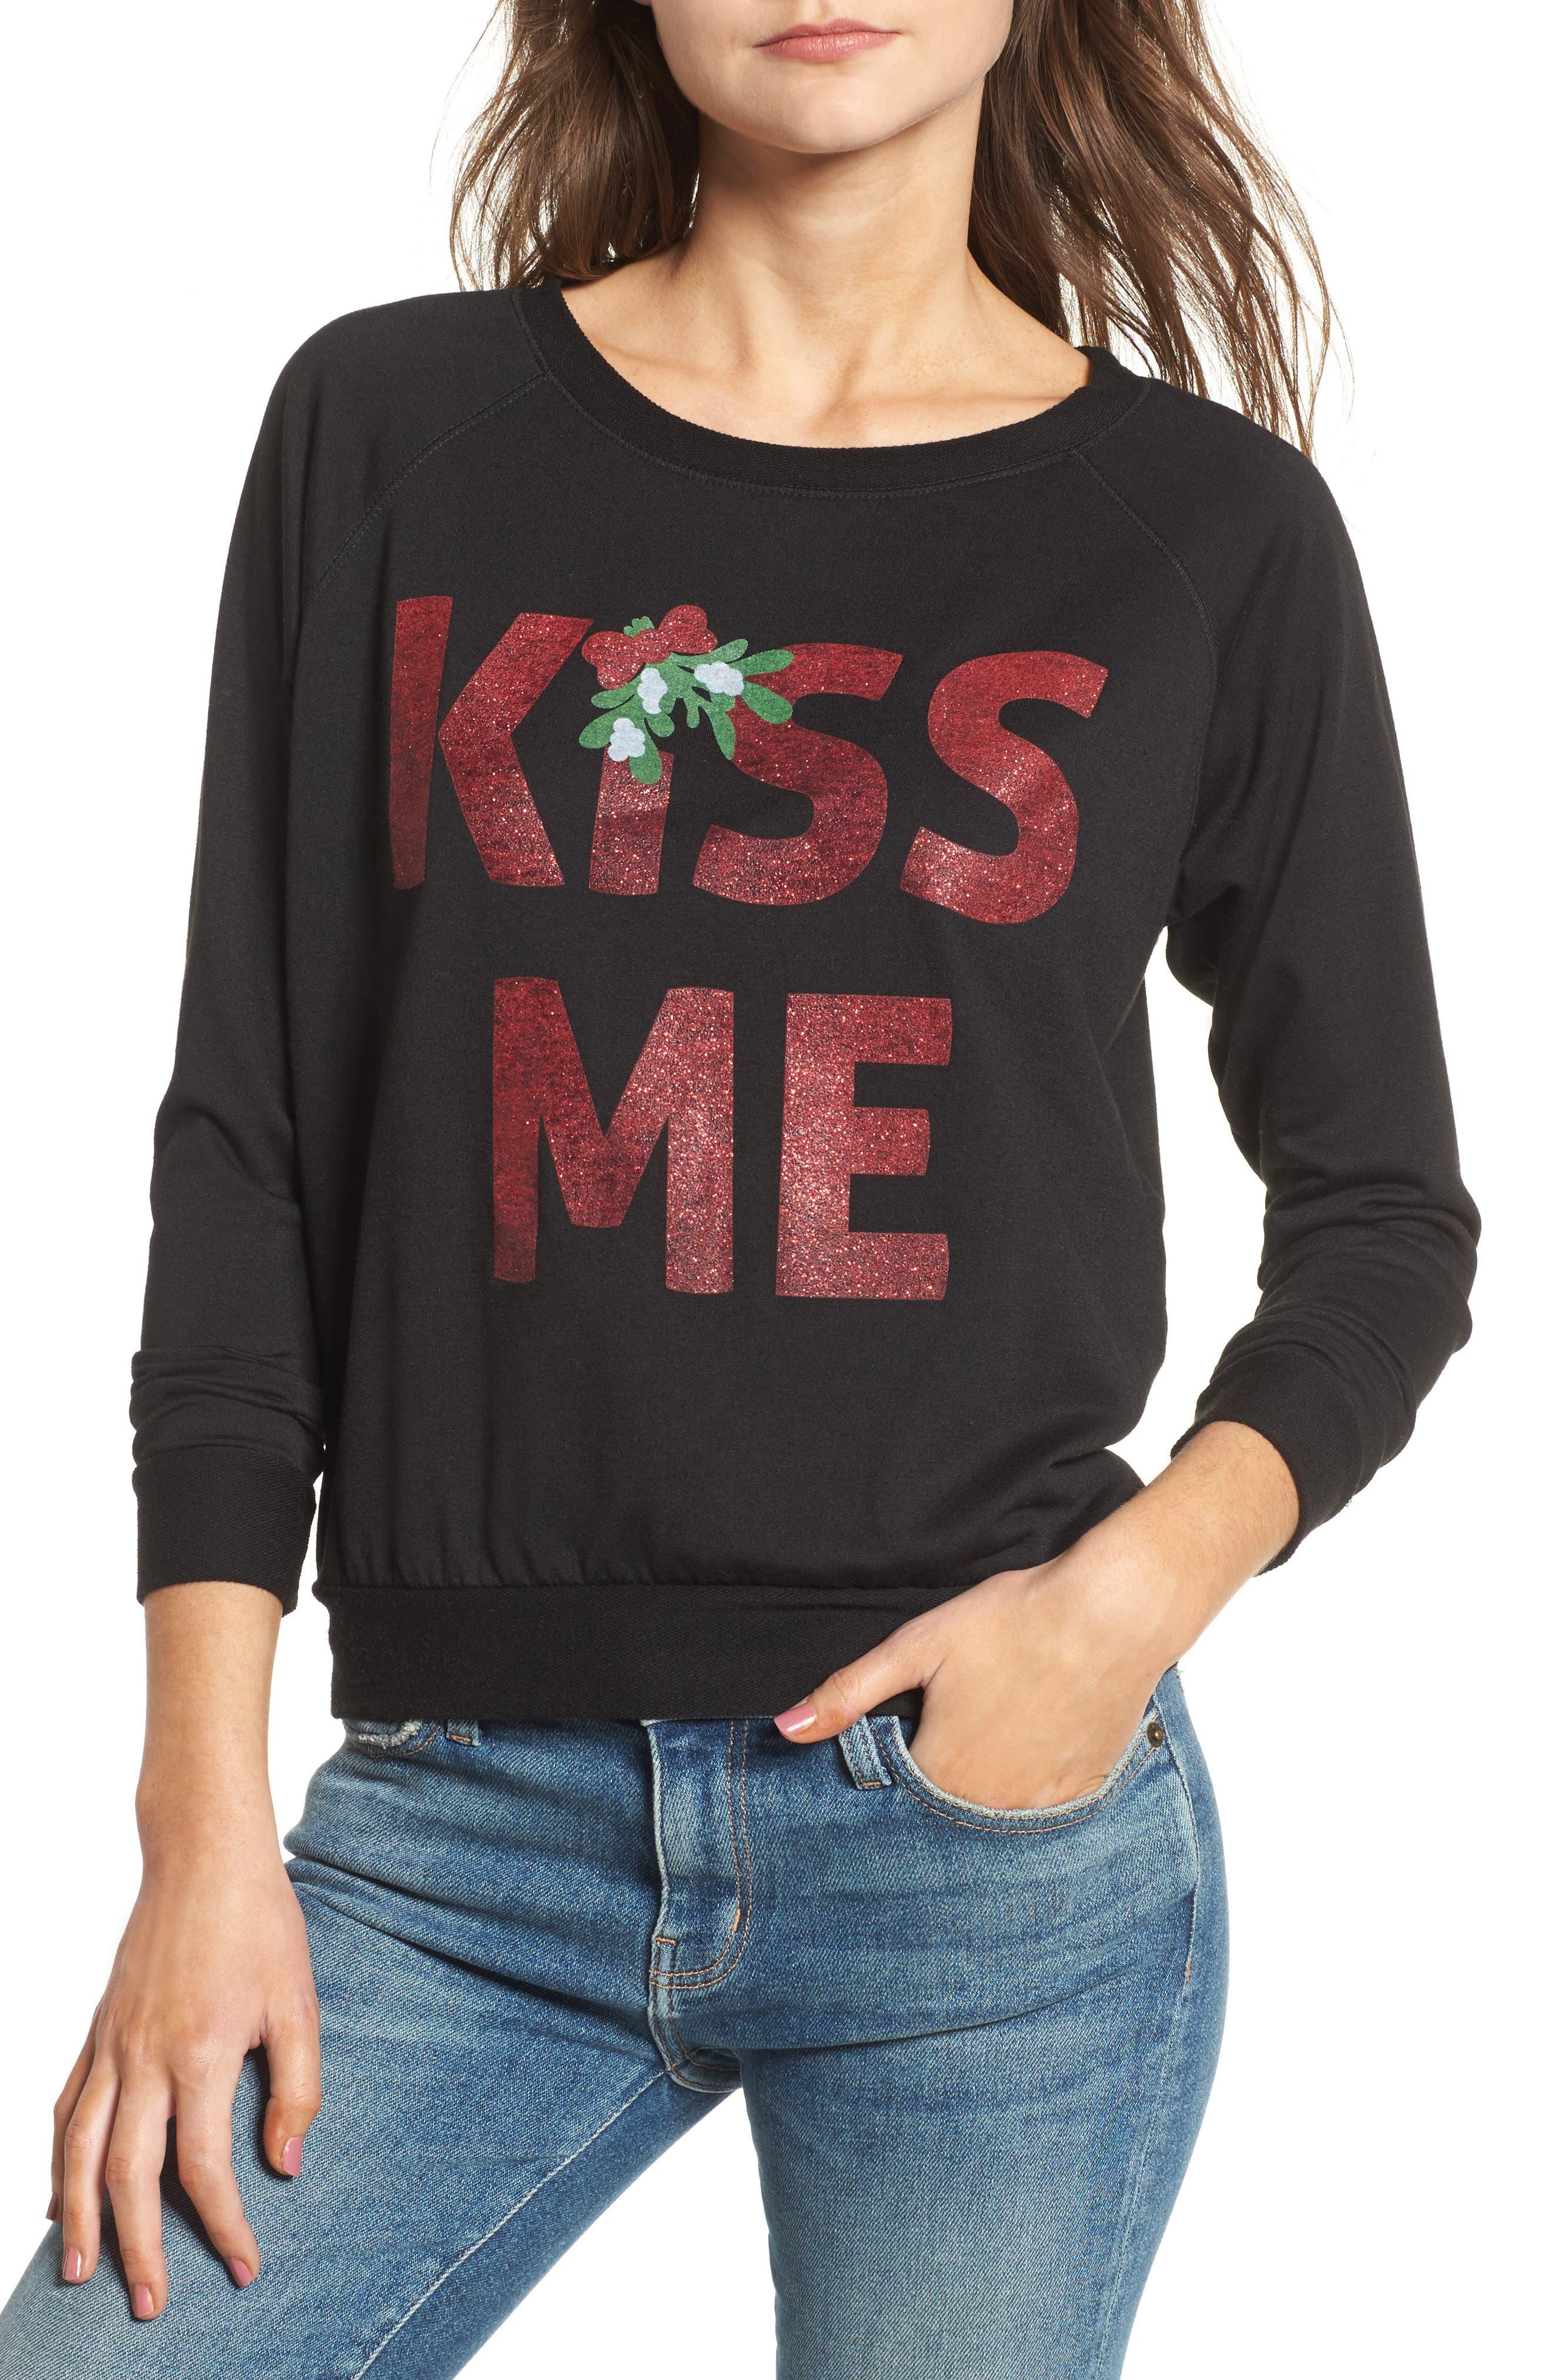 Prince Peter Kiss Me Sweatshirt